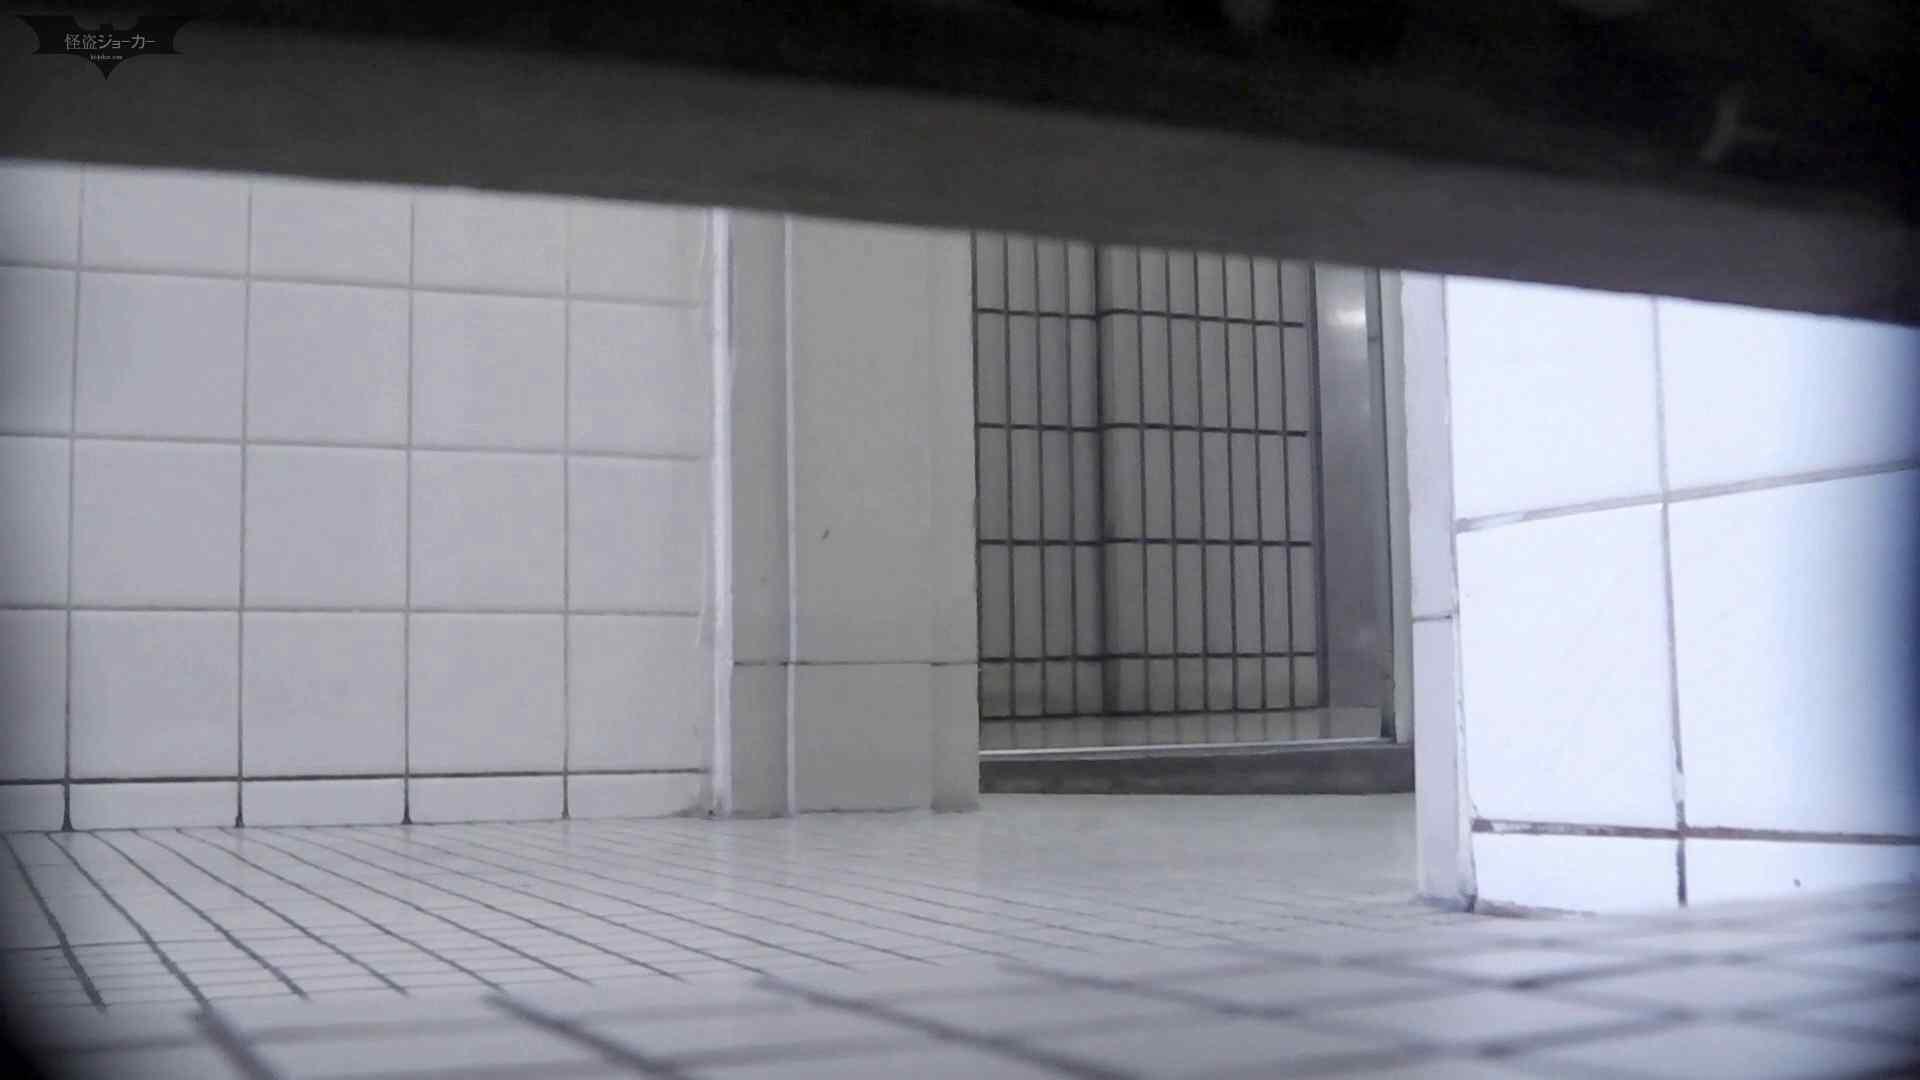 洗面所特攻隊 vol.66 珍事件発生!! 「指」で出【2015・05位】 盛合せ エロ無料画像 80枚 39